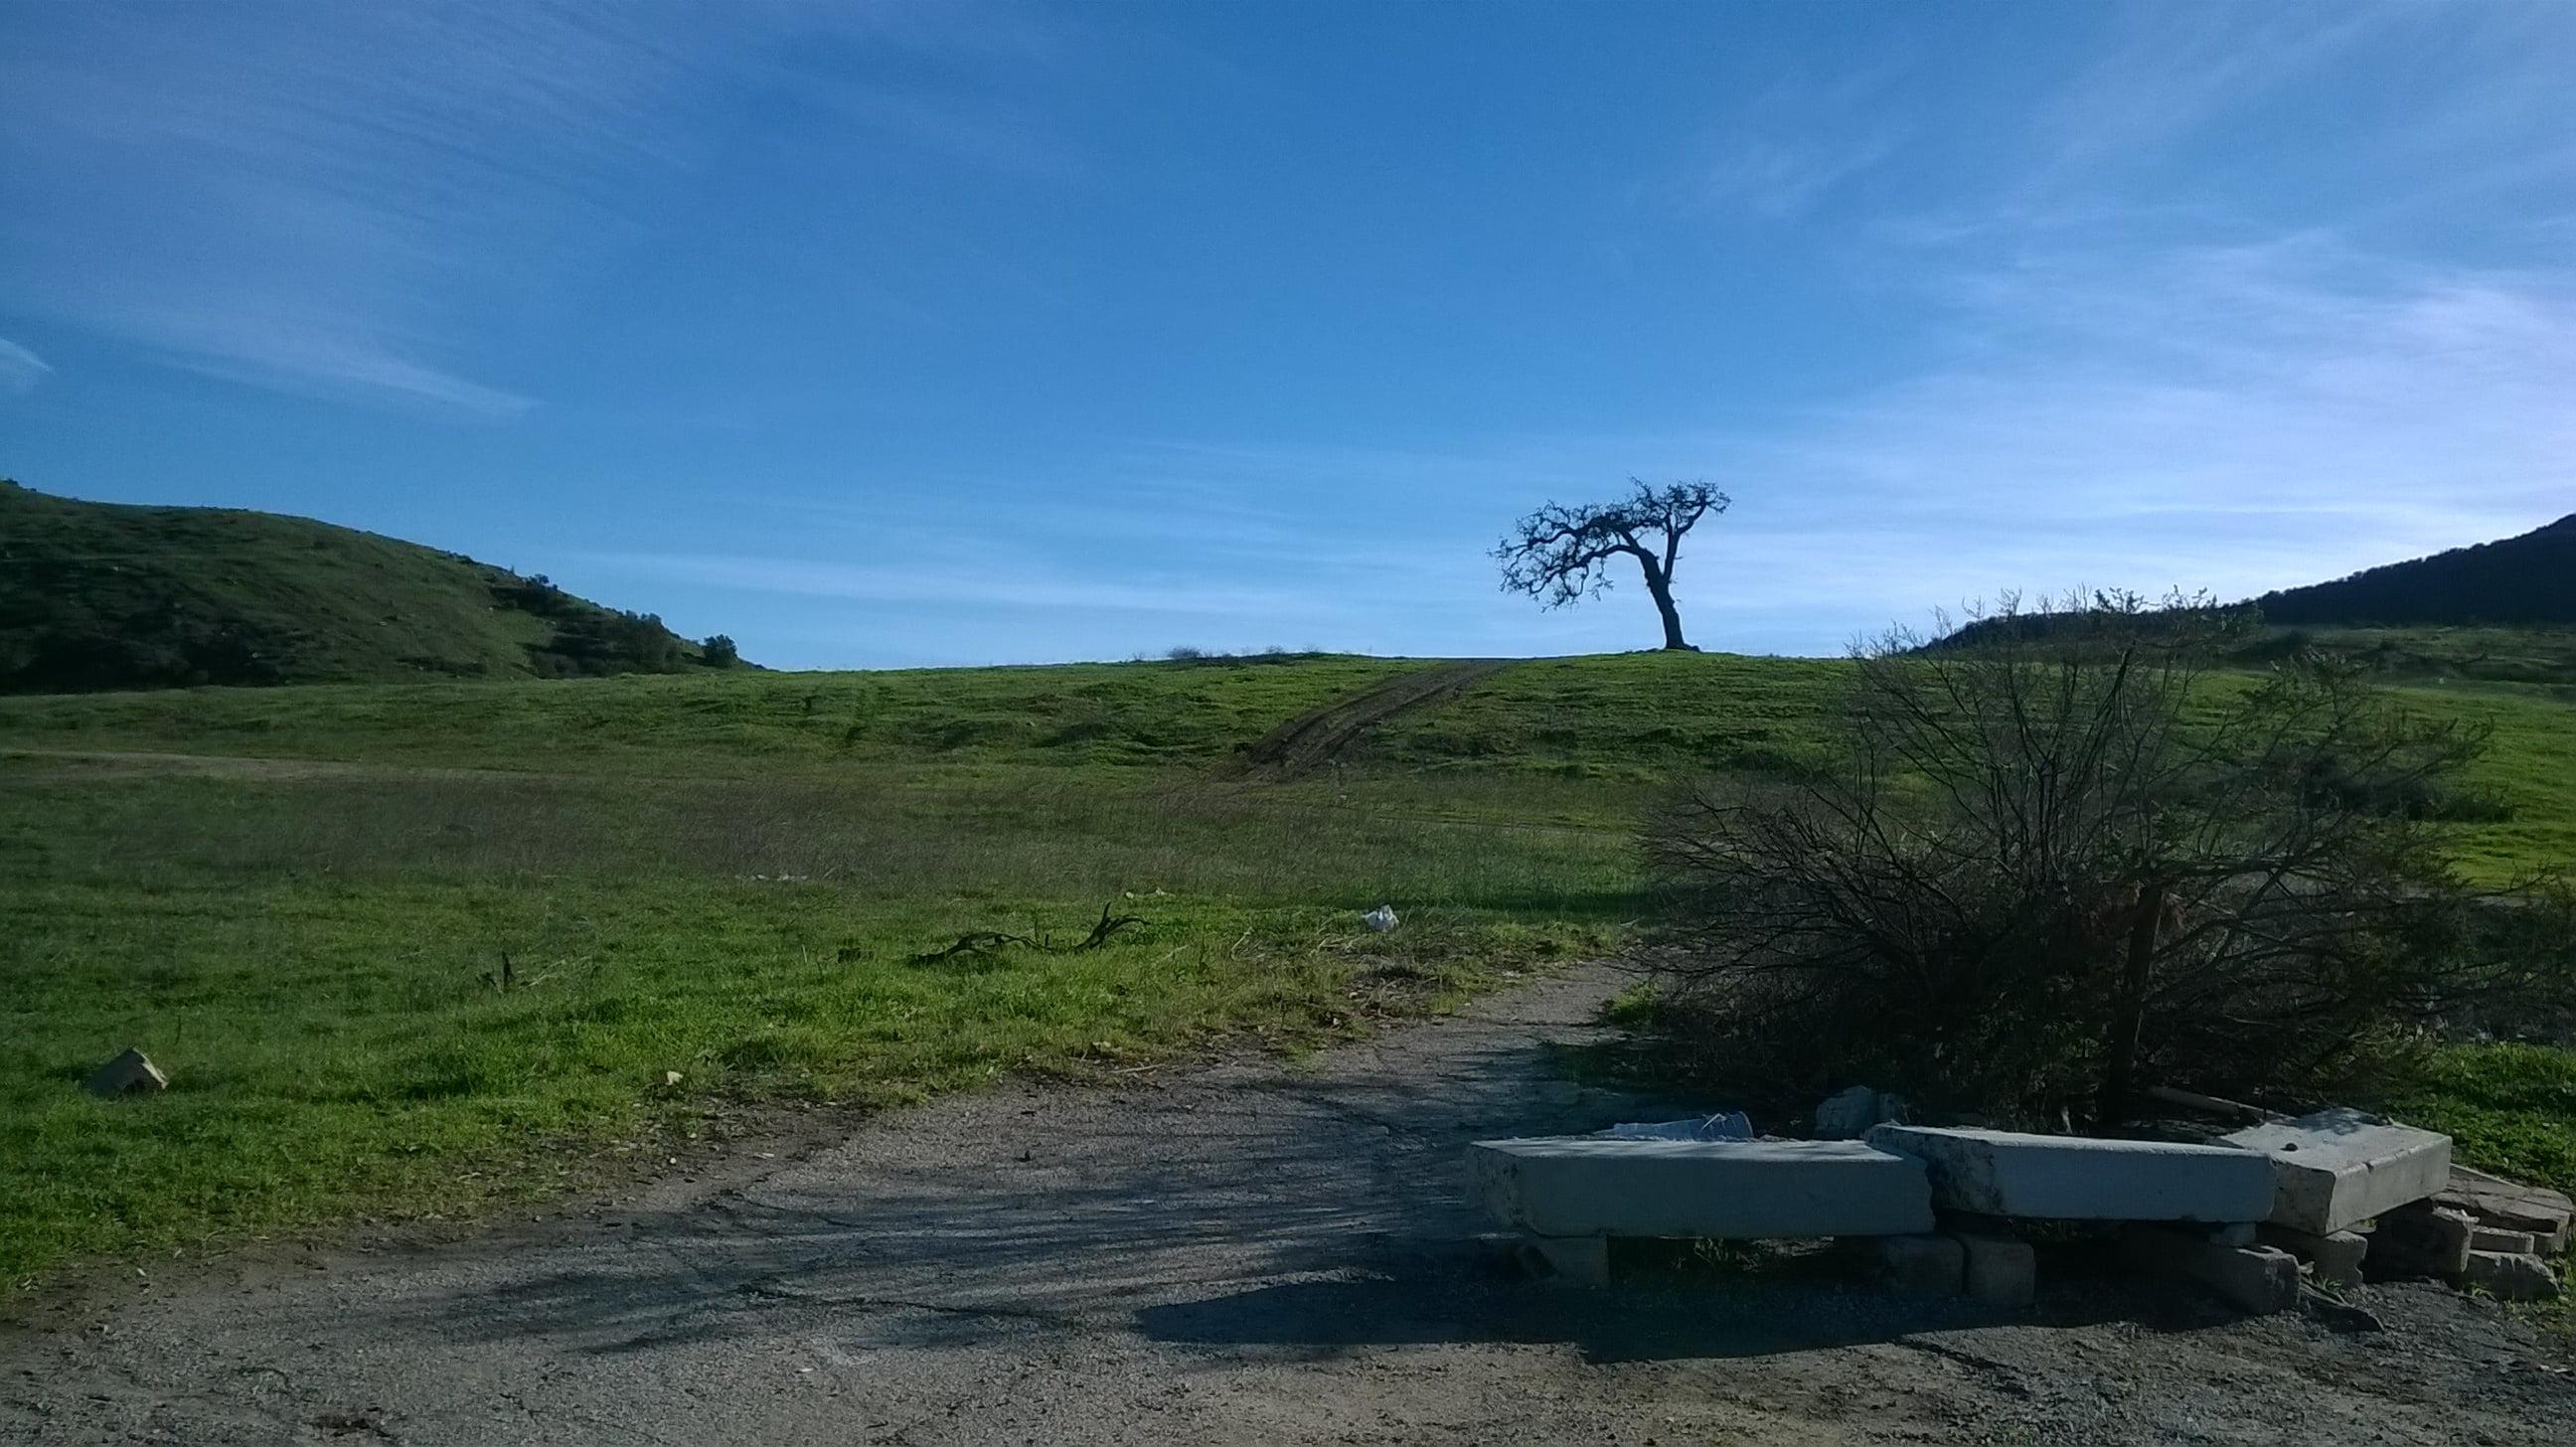 phantasm-filming-locations-hanging-tree-agoura-hills